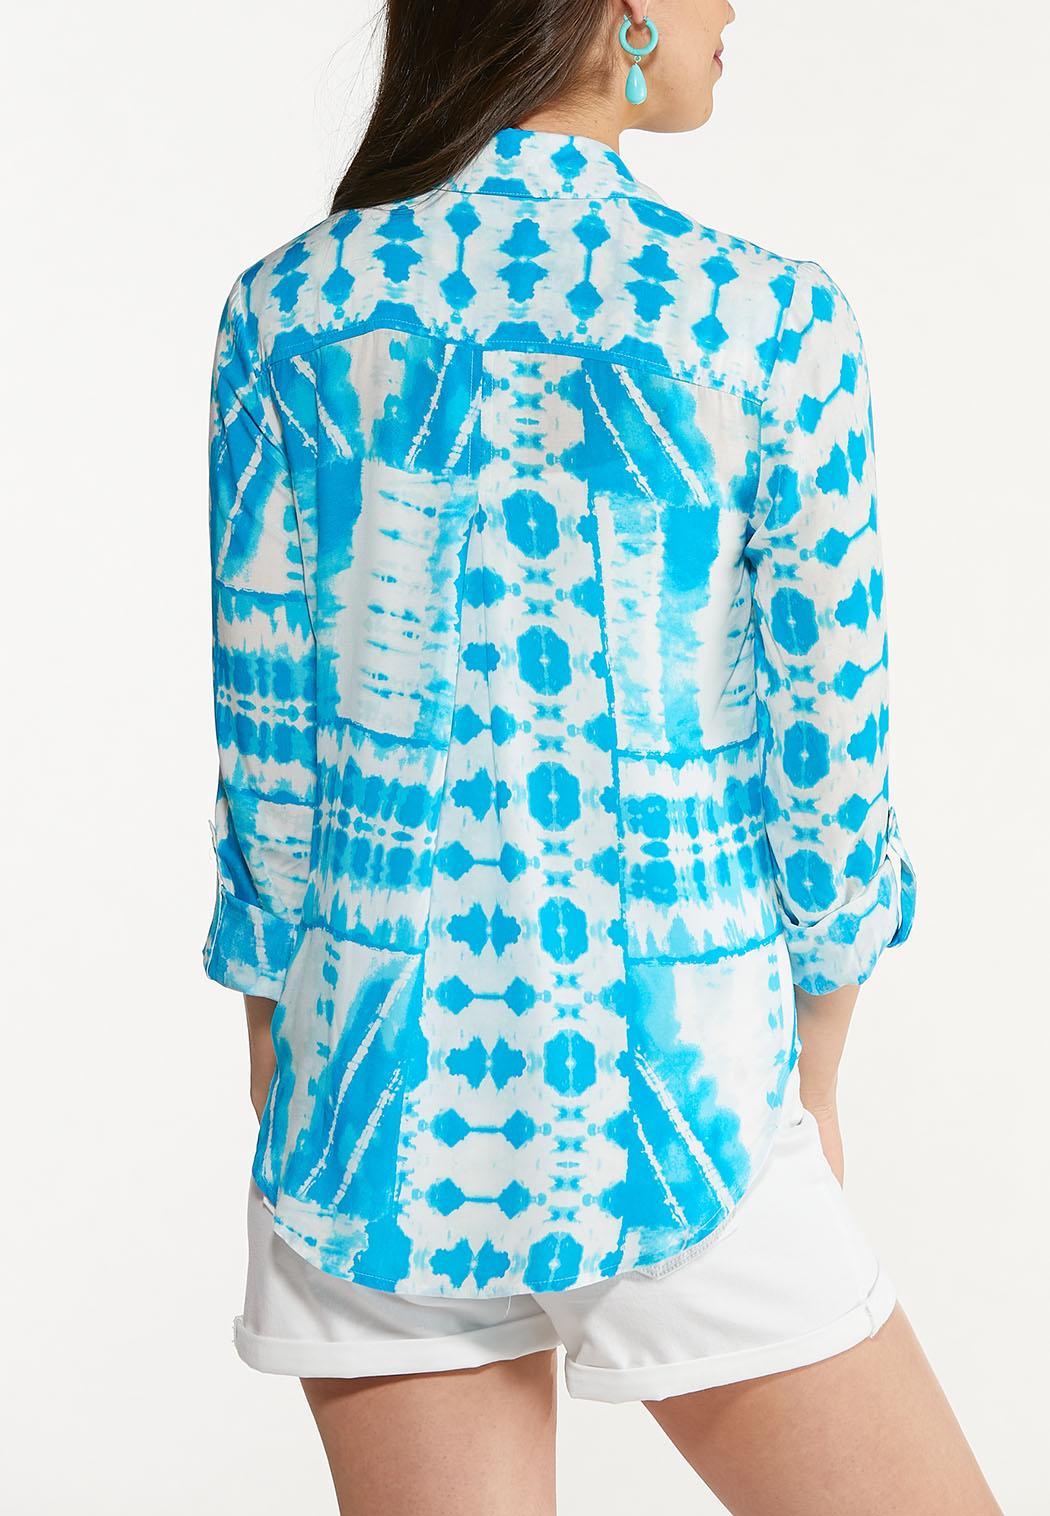 Plus Size Turquoise Tie Dye Top (Item #44608319)